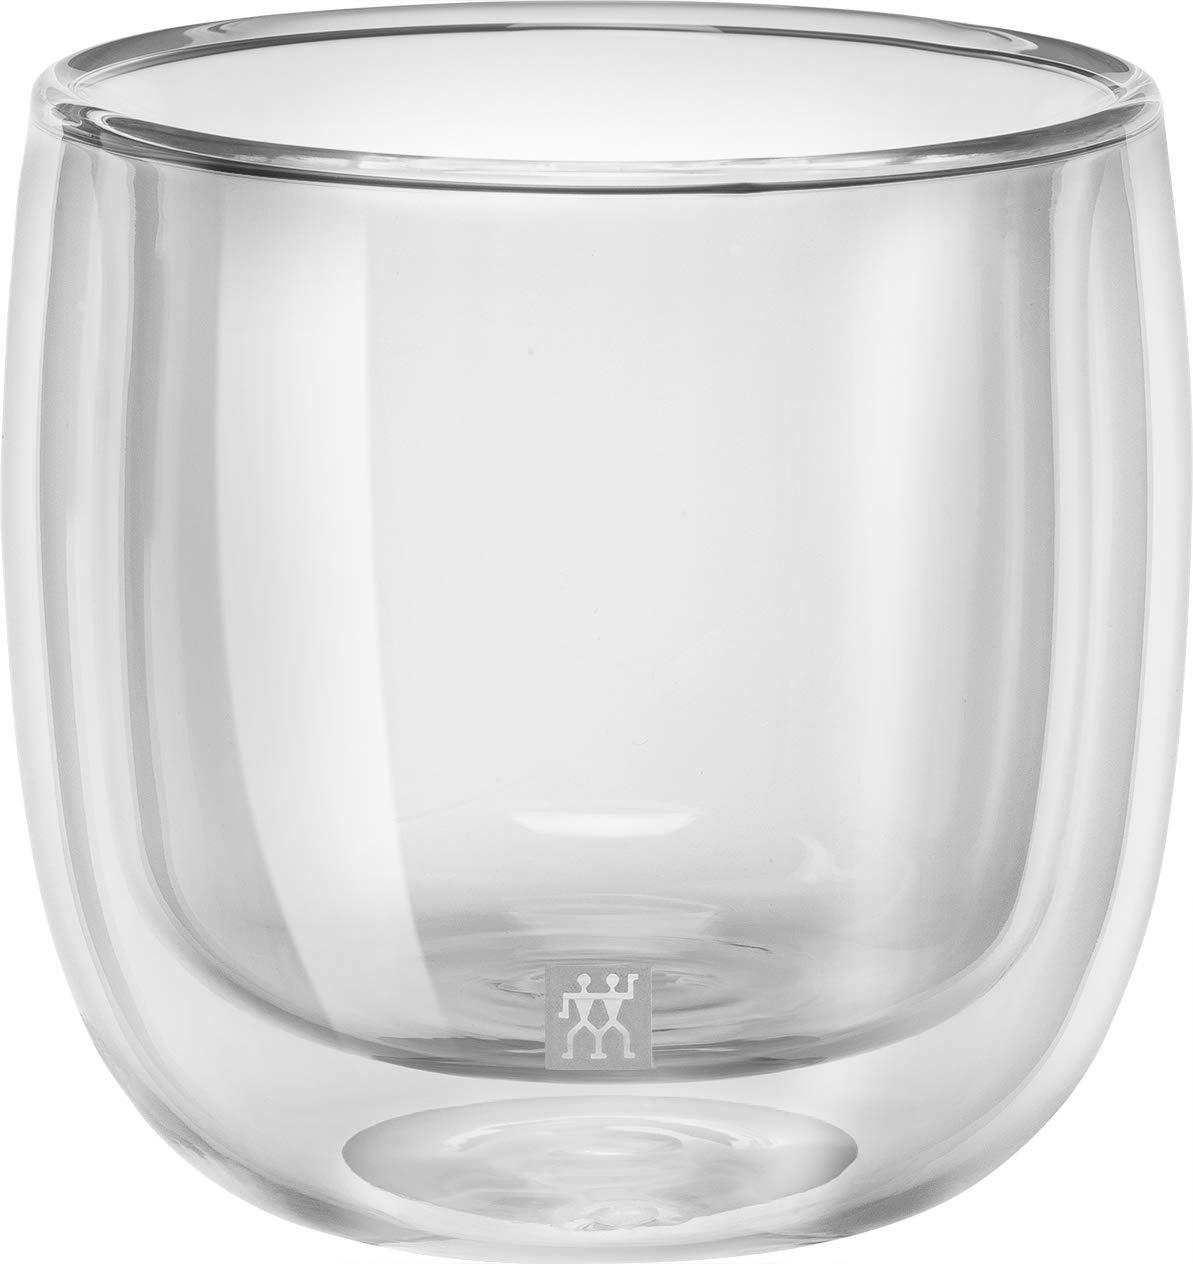 ZWILLING J.A 2 Piece Set Glass HENCKELS 39500-077 Sorrento Double Wall Tea Glass